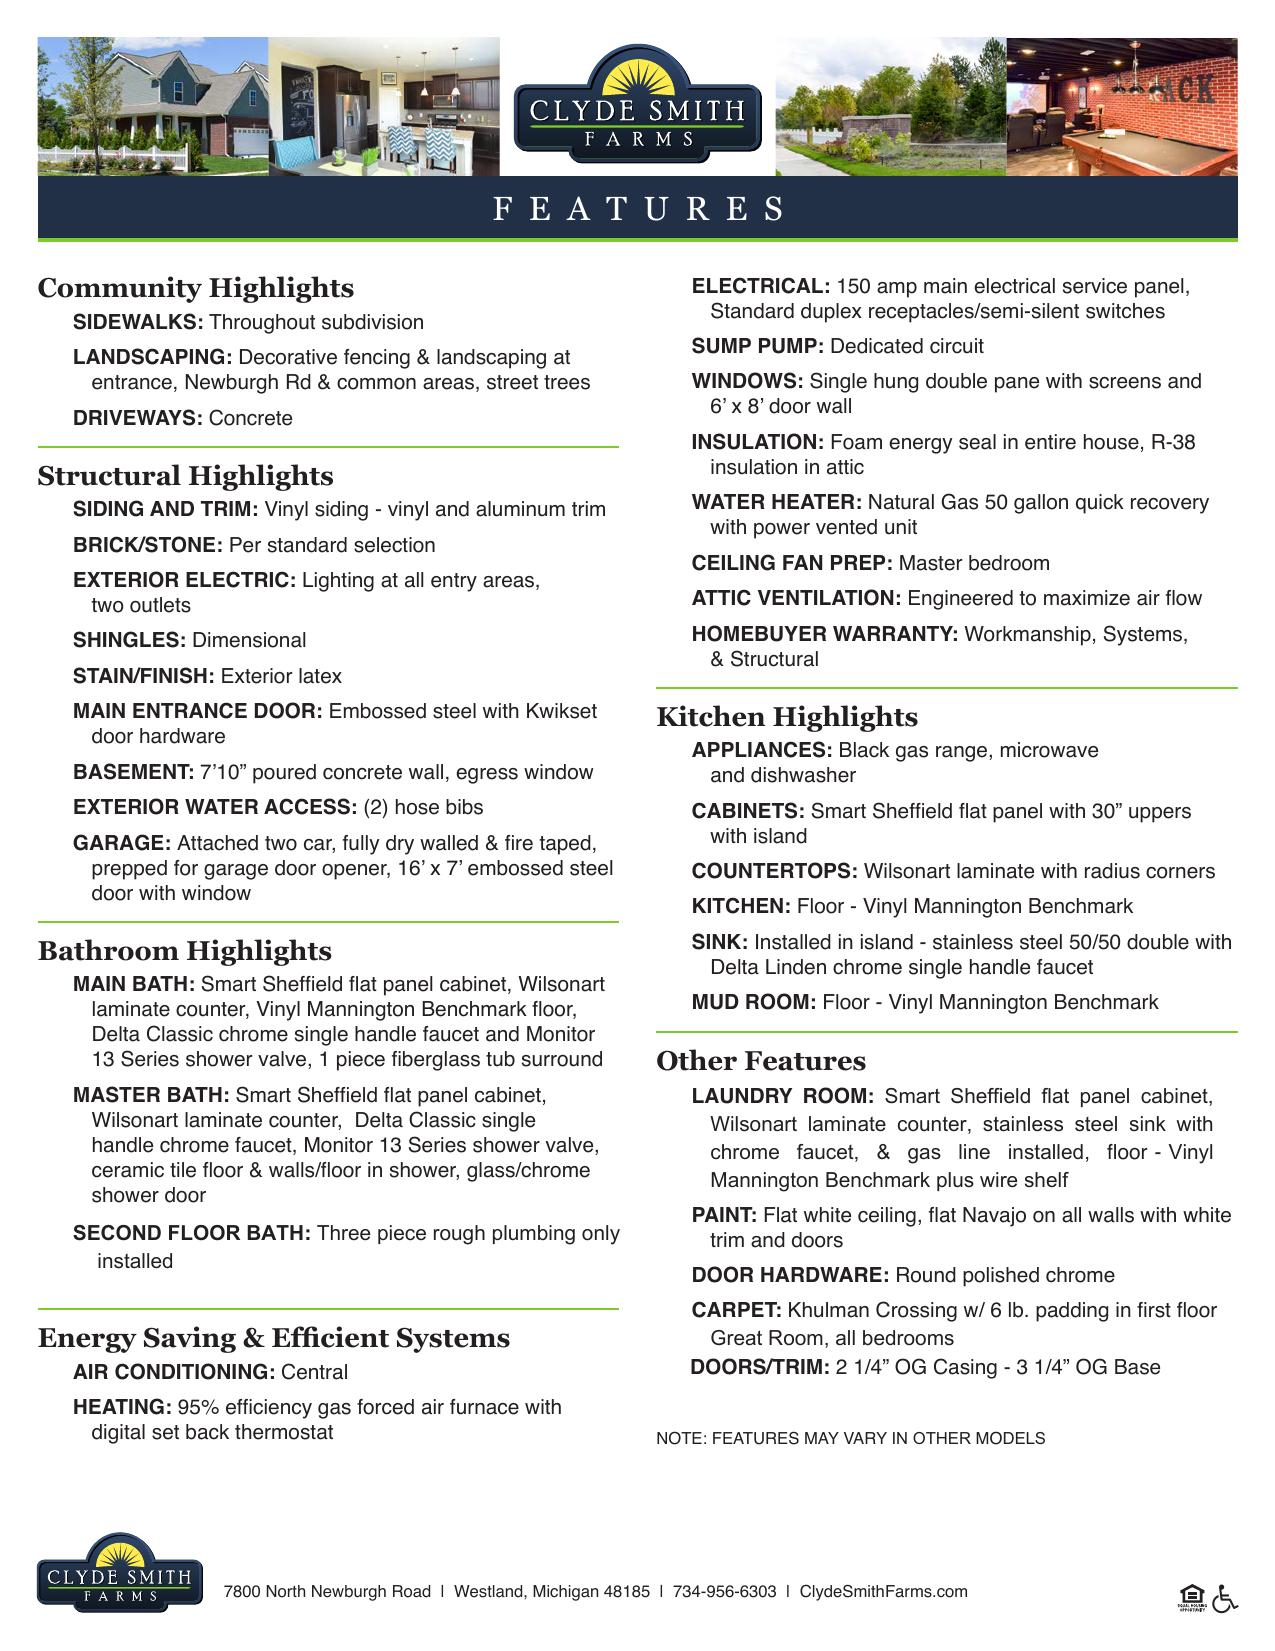 features - Clyde Smith Farms | manualzz com